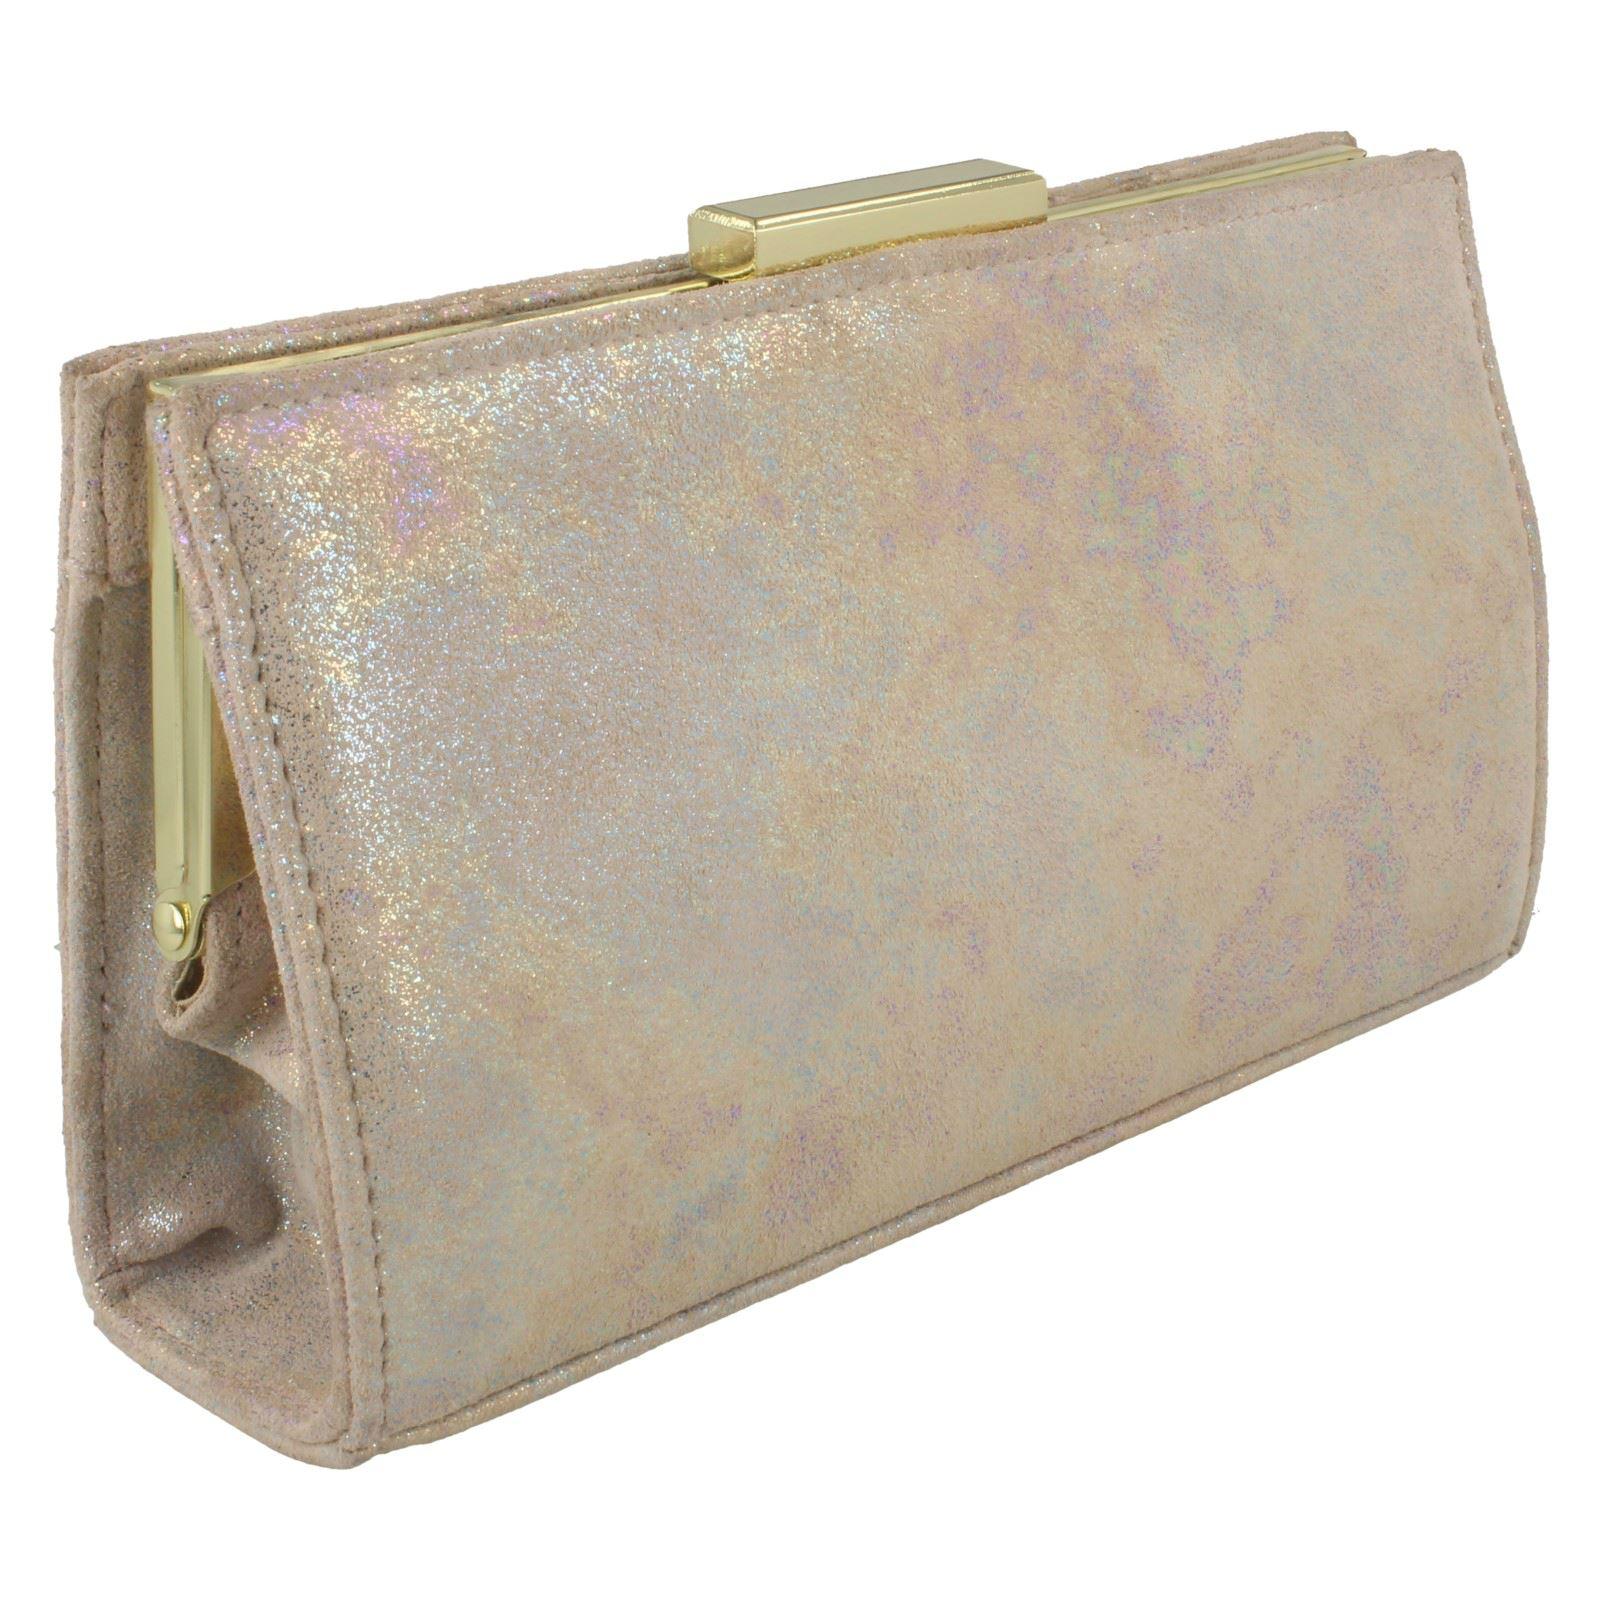 0c6e6677883a Van-Dal-Ladies-Classic-Clutch-Bags-Zinnia thumbnail 48